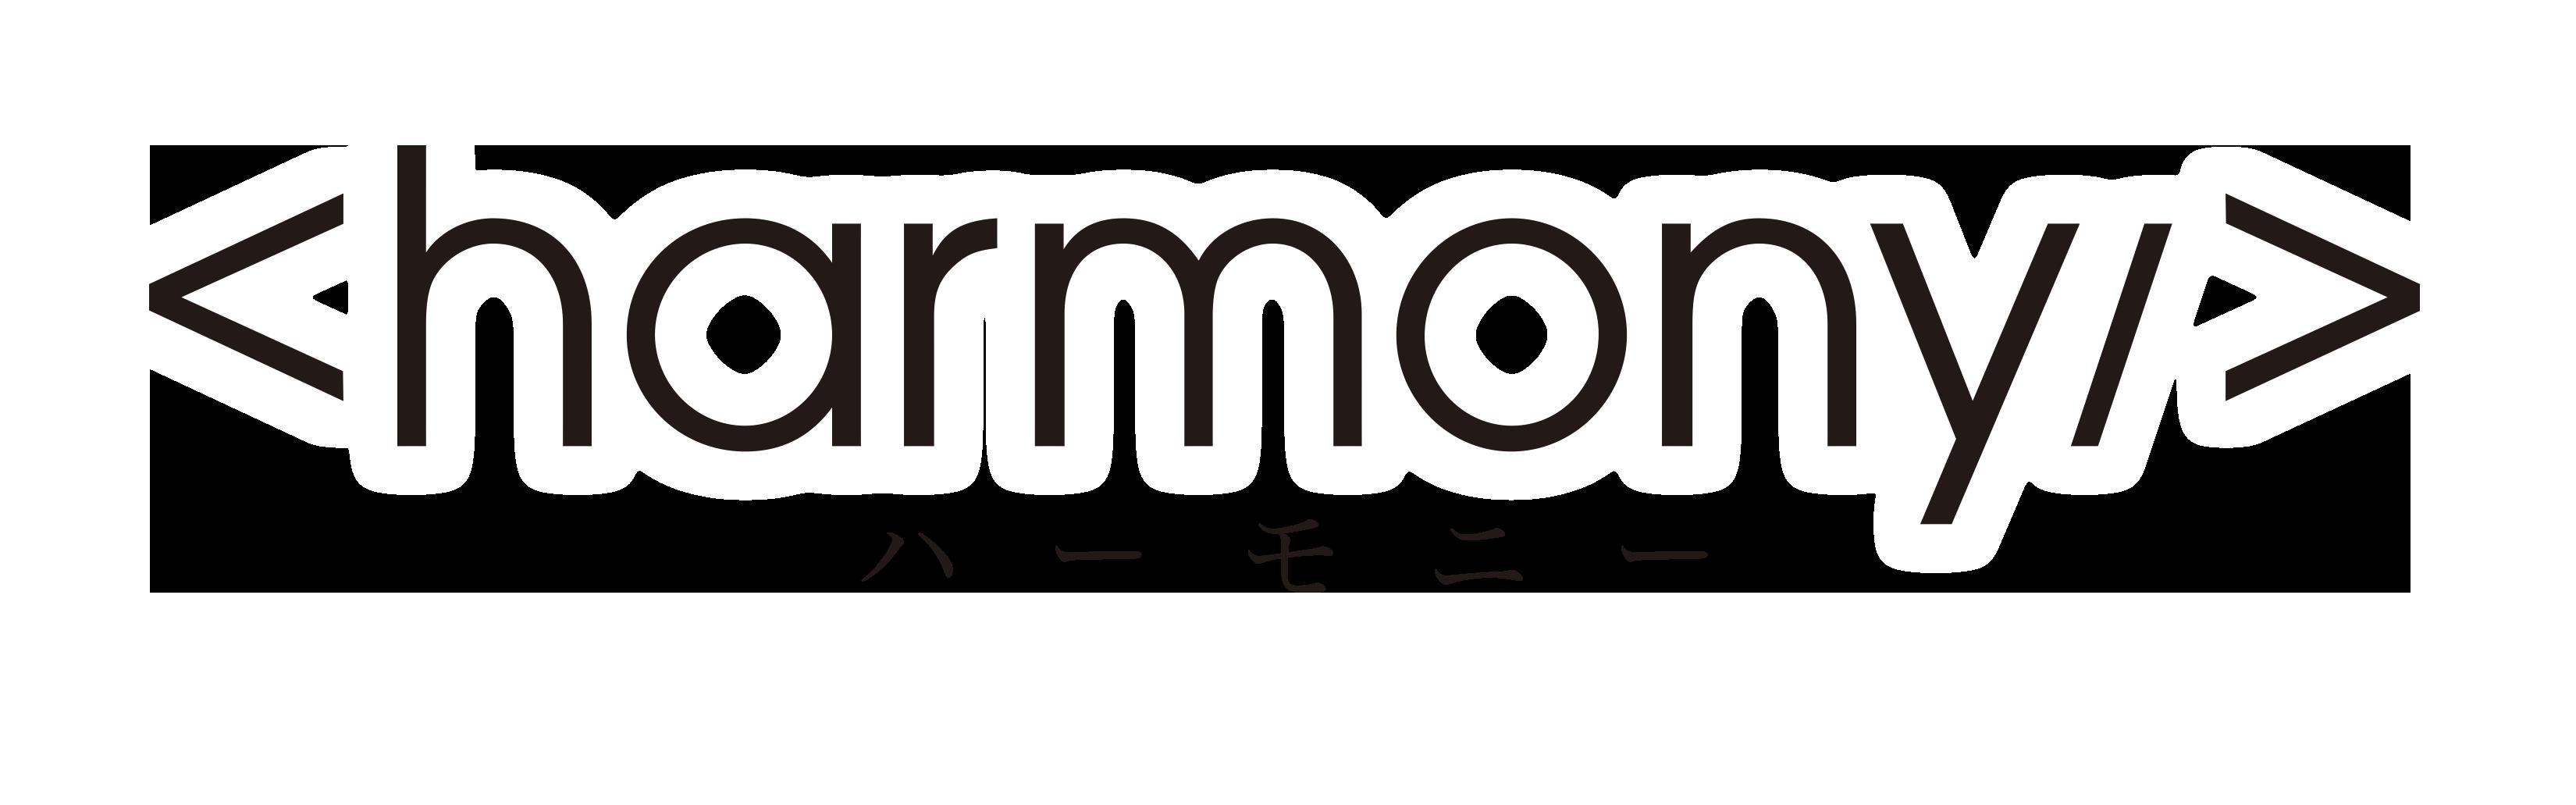 Harmony Project Itoh Ger Sub